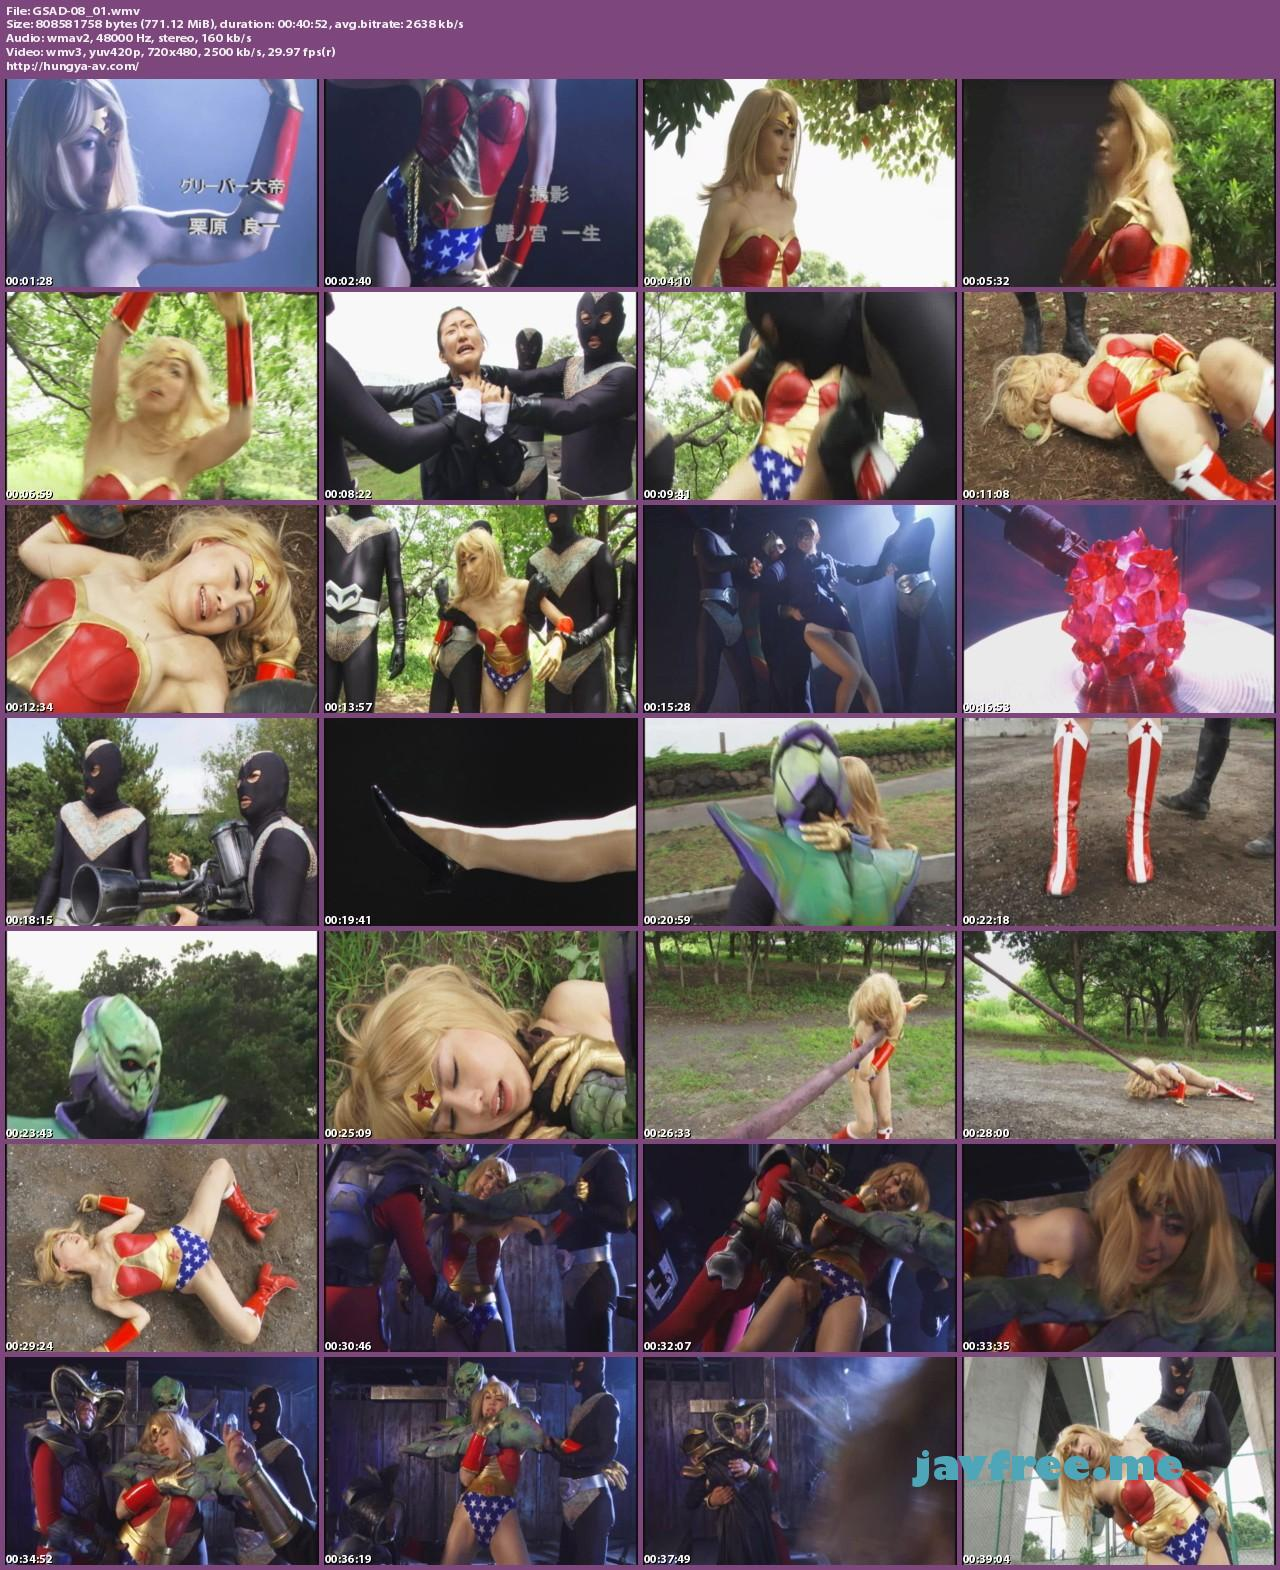 [GSAD 08] SUPER HEROINE アクションウォーズ 鉄腕美女ダイナウーマン あいかわ優衣 Yui Aikawa GIGA あいかわ優衣 gsad GIGA